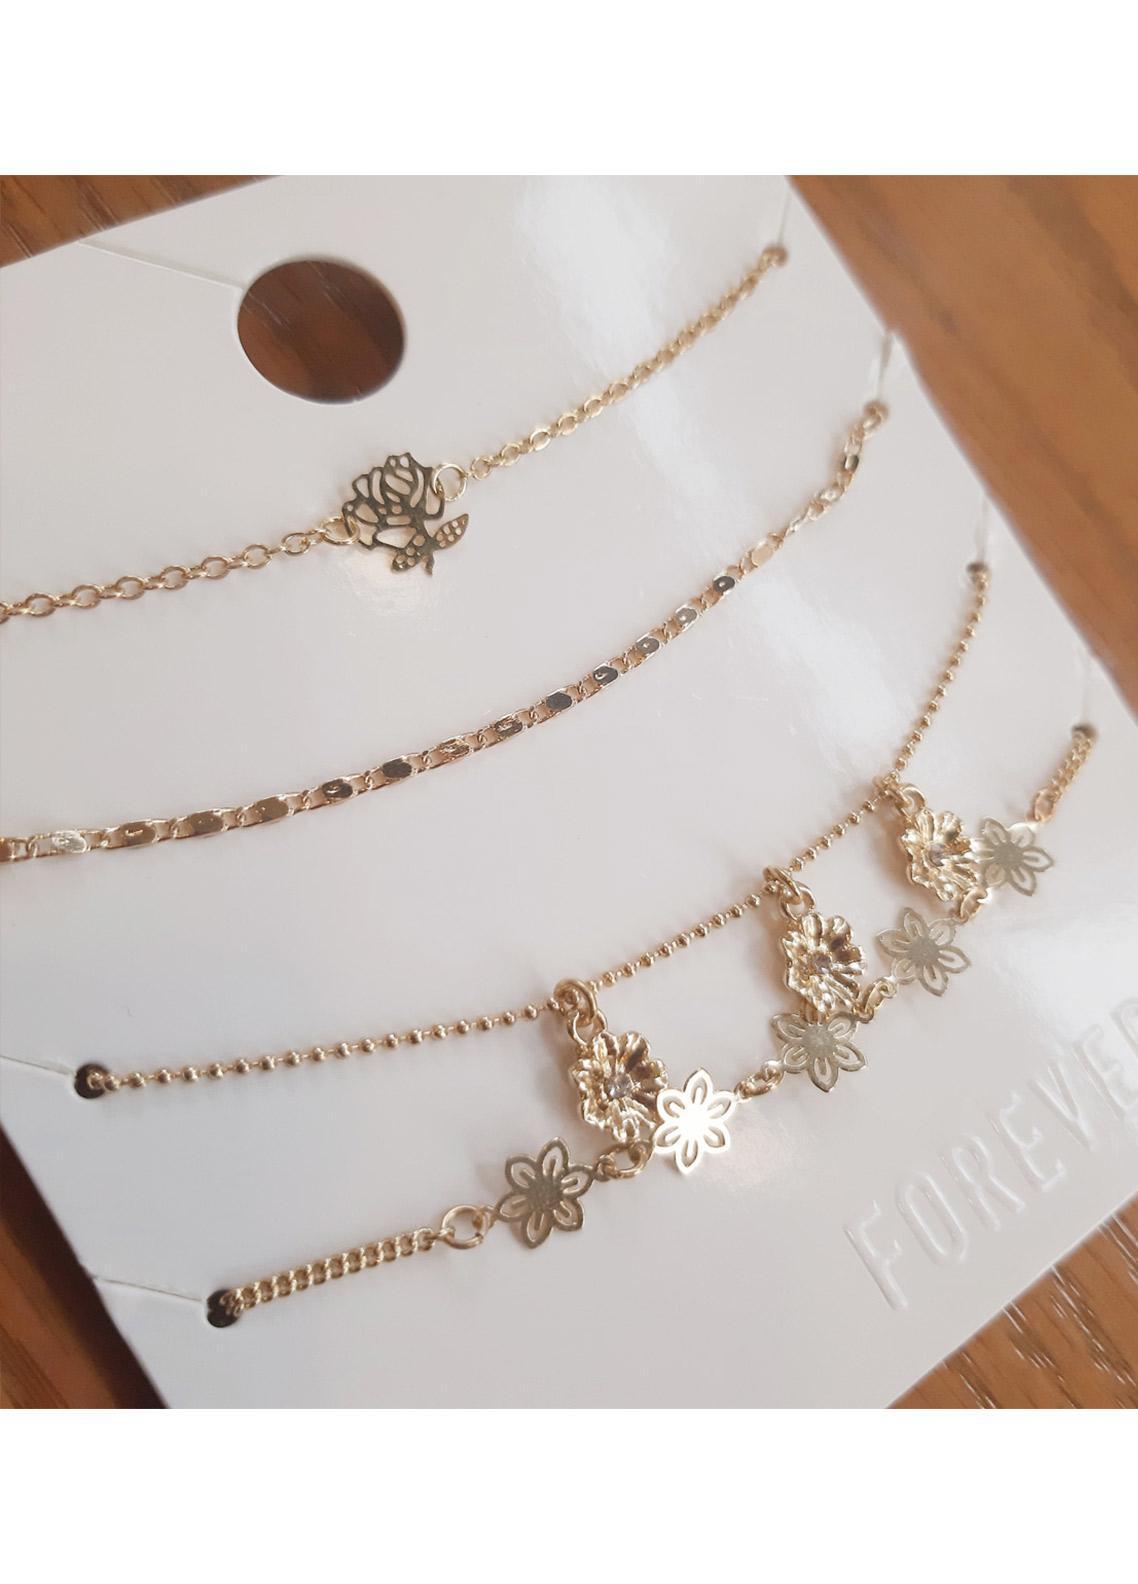 Crystal Floral Charm Bracelet Set  - Ladies Jewellery